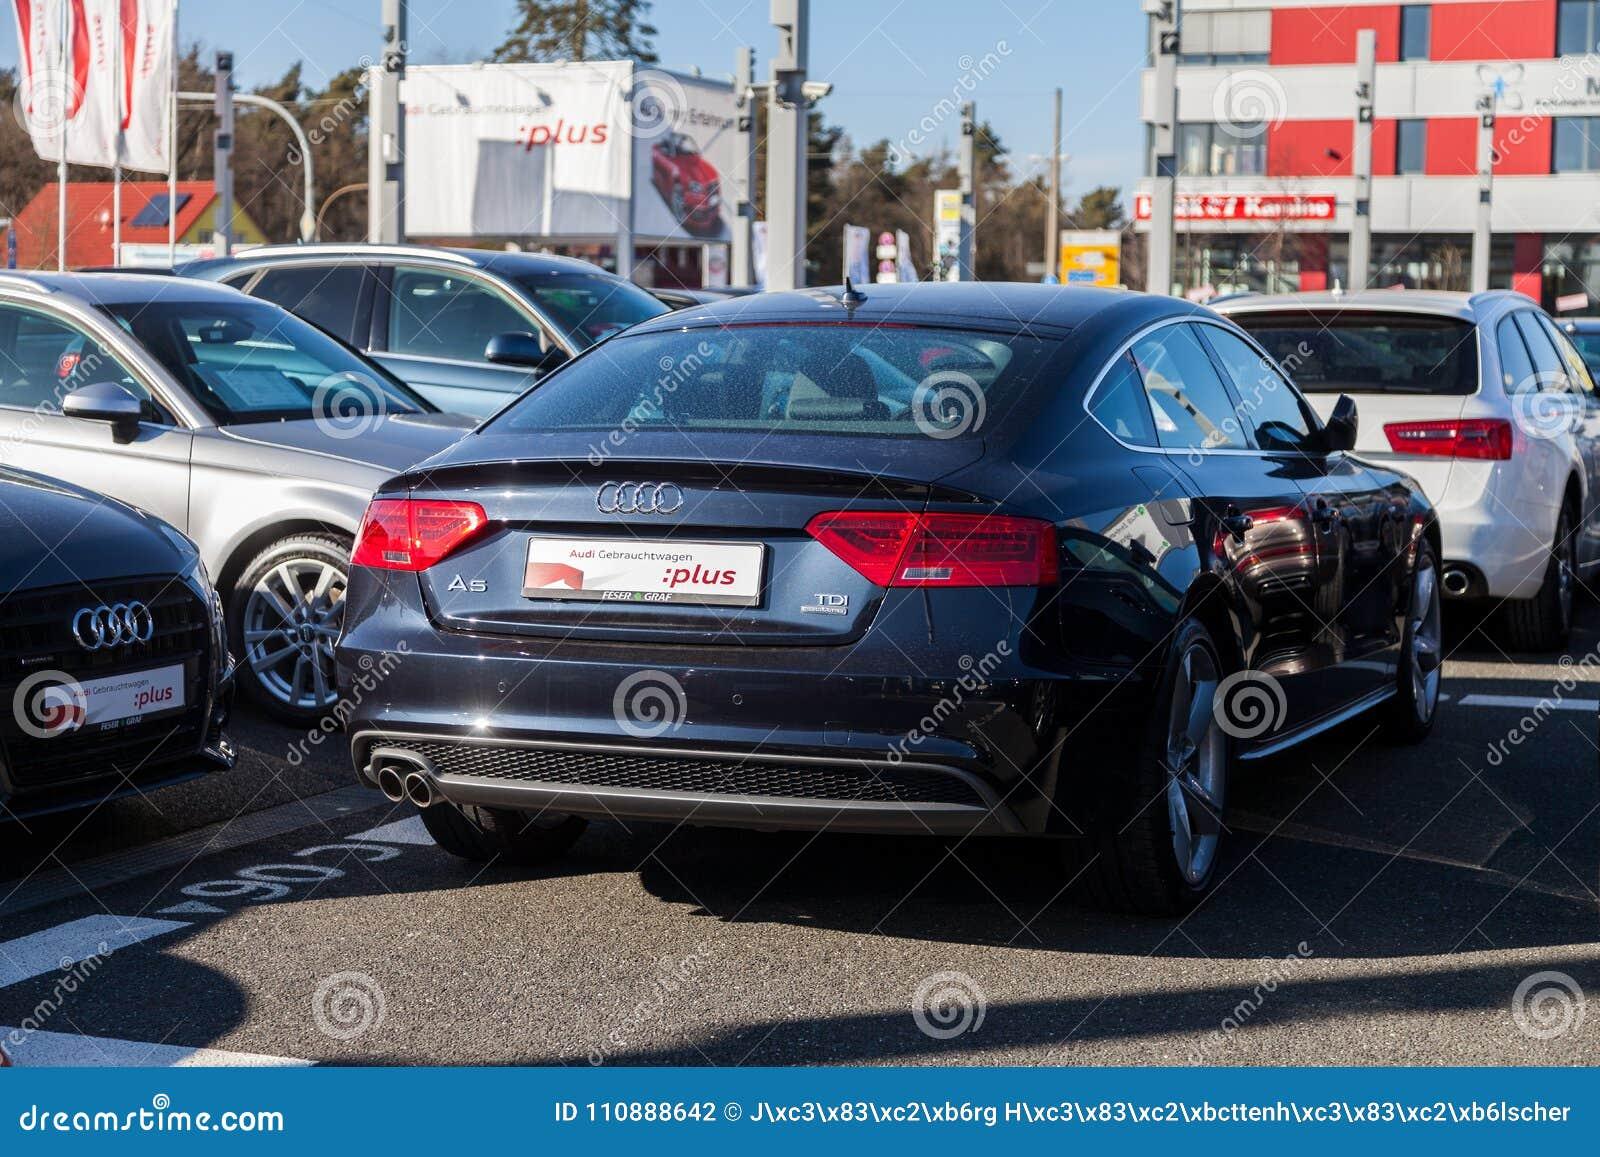 Audi Emblem On An Audi Car Editorial Photography Image Of Color